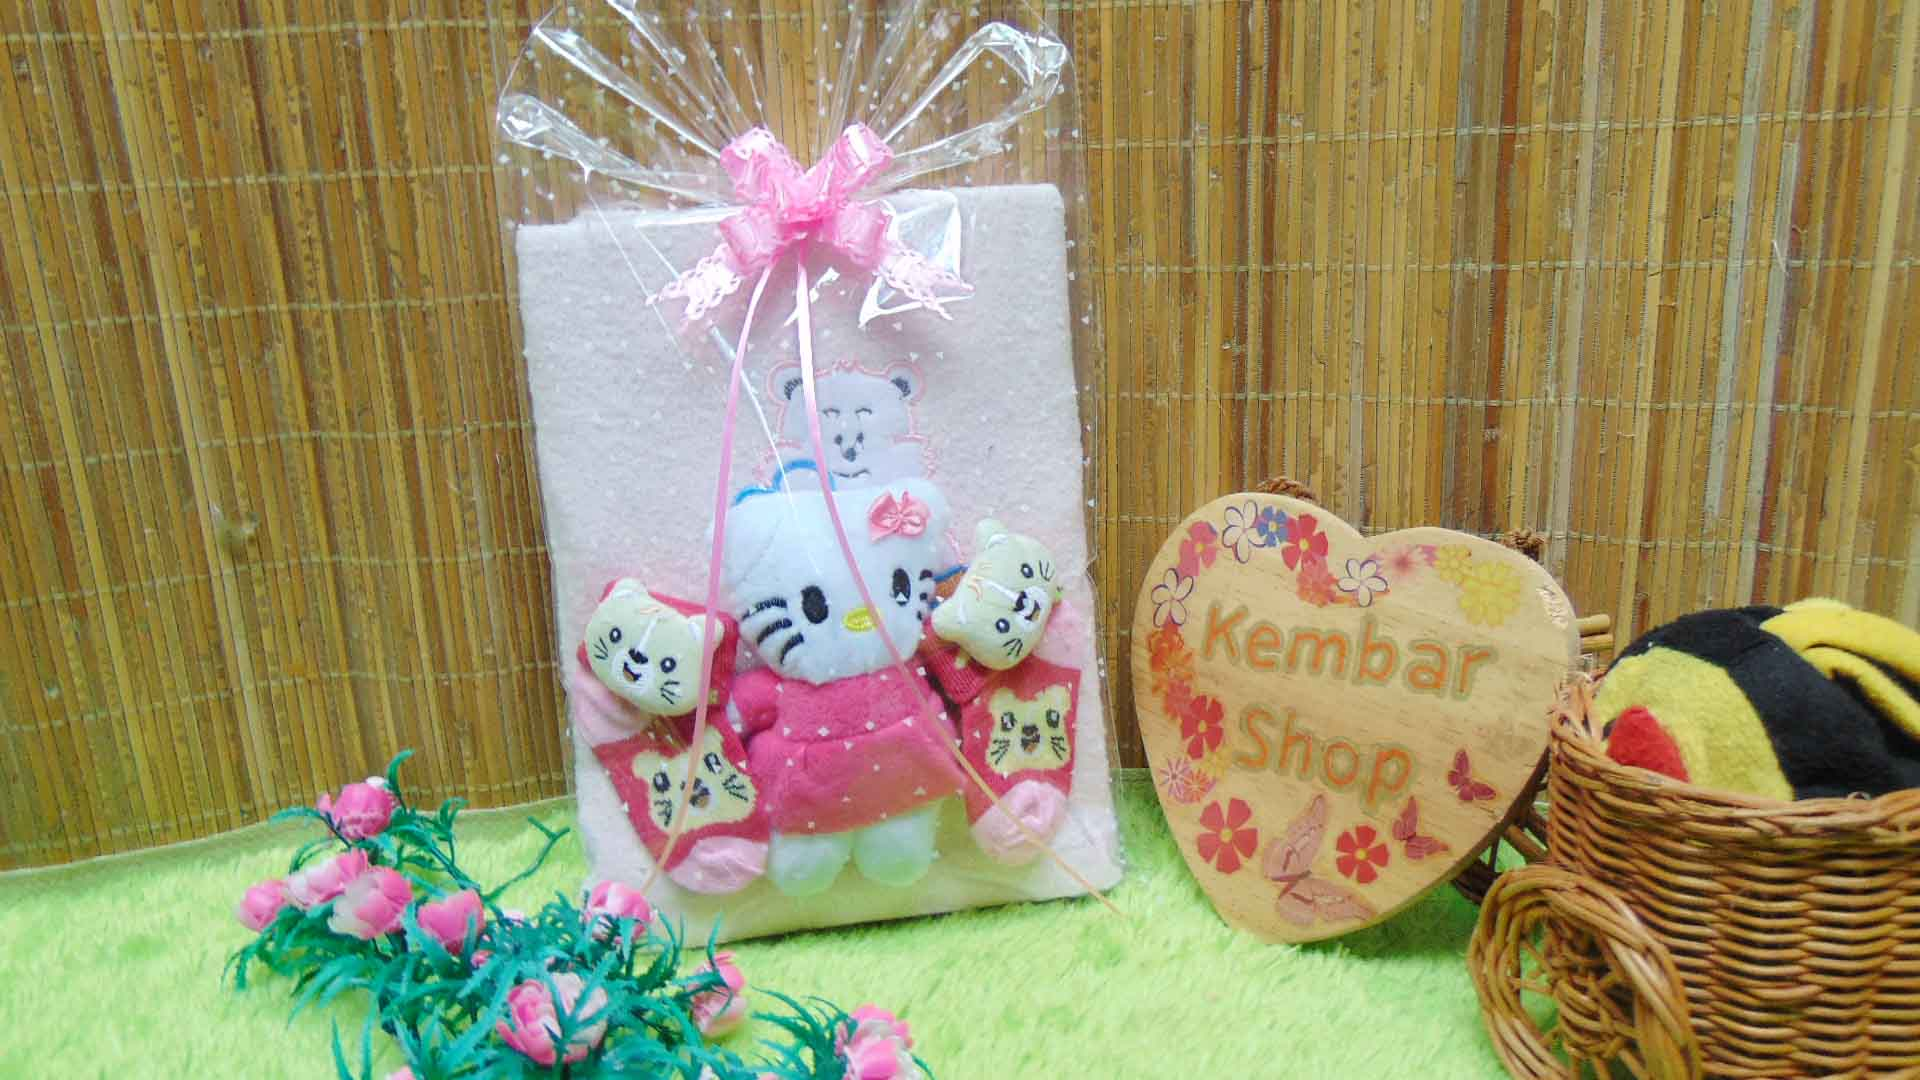 foto utama - FREE KARTU UCAPAN hampers baby gift set paket kado lahiran souvenir bayi newborn HANDUK SOCK BONEKA pink